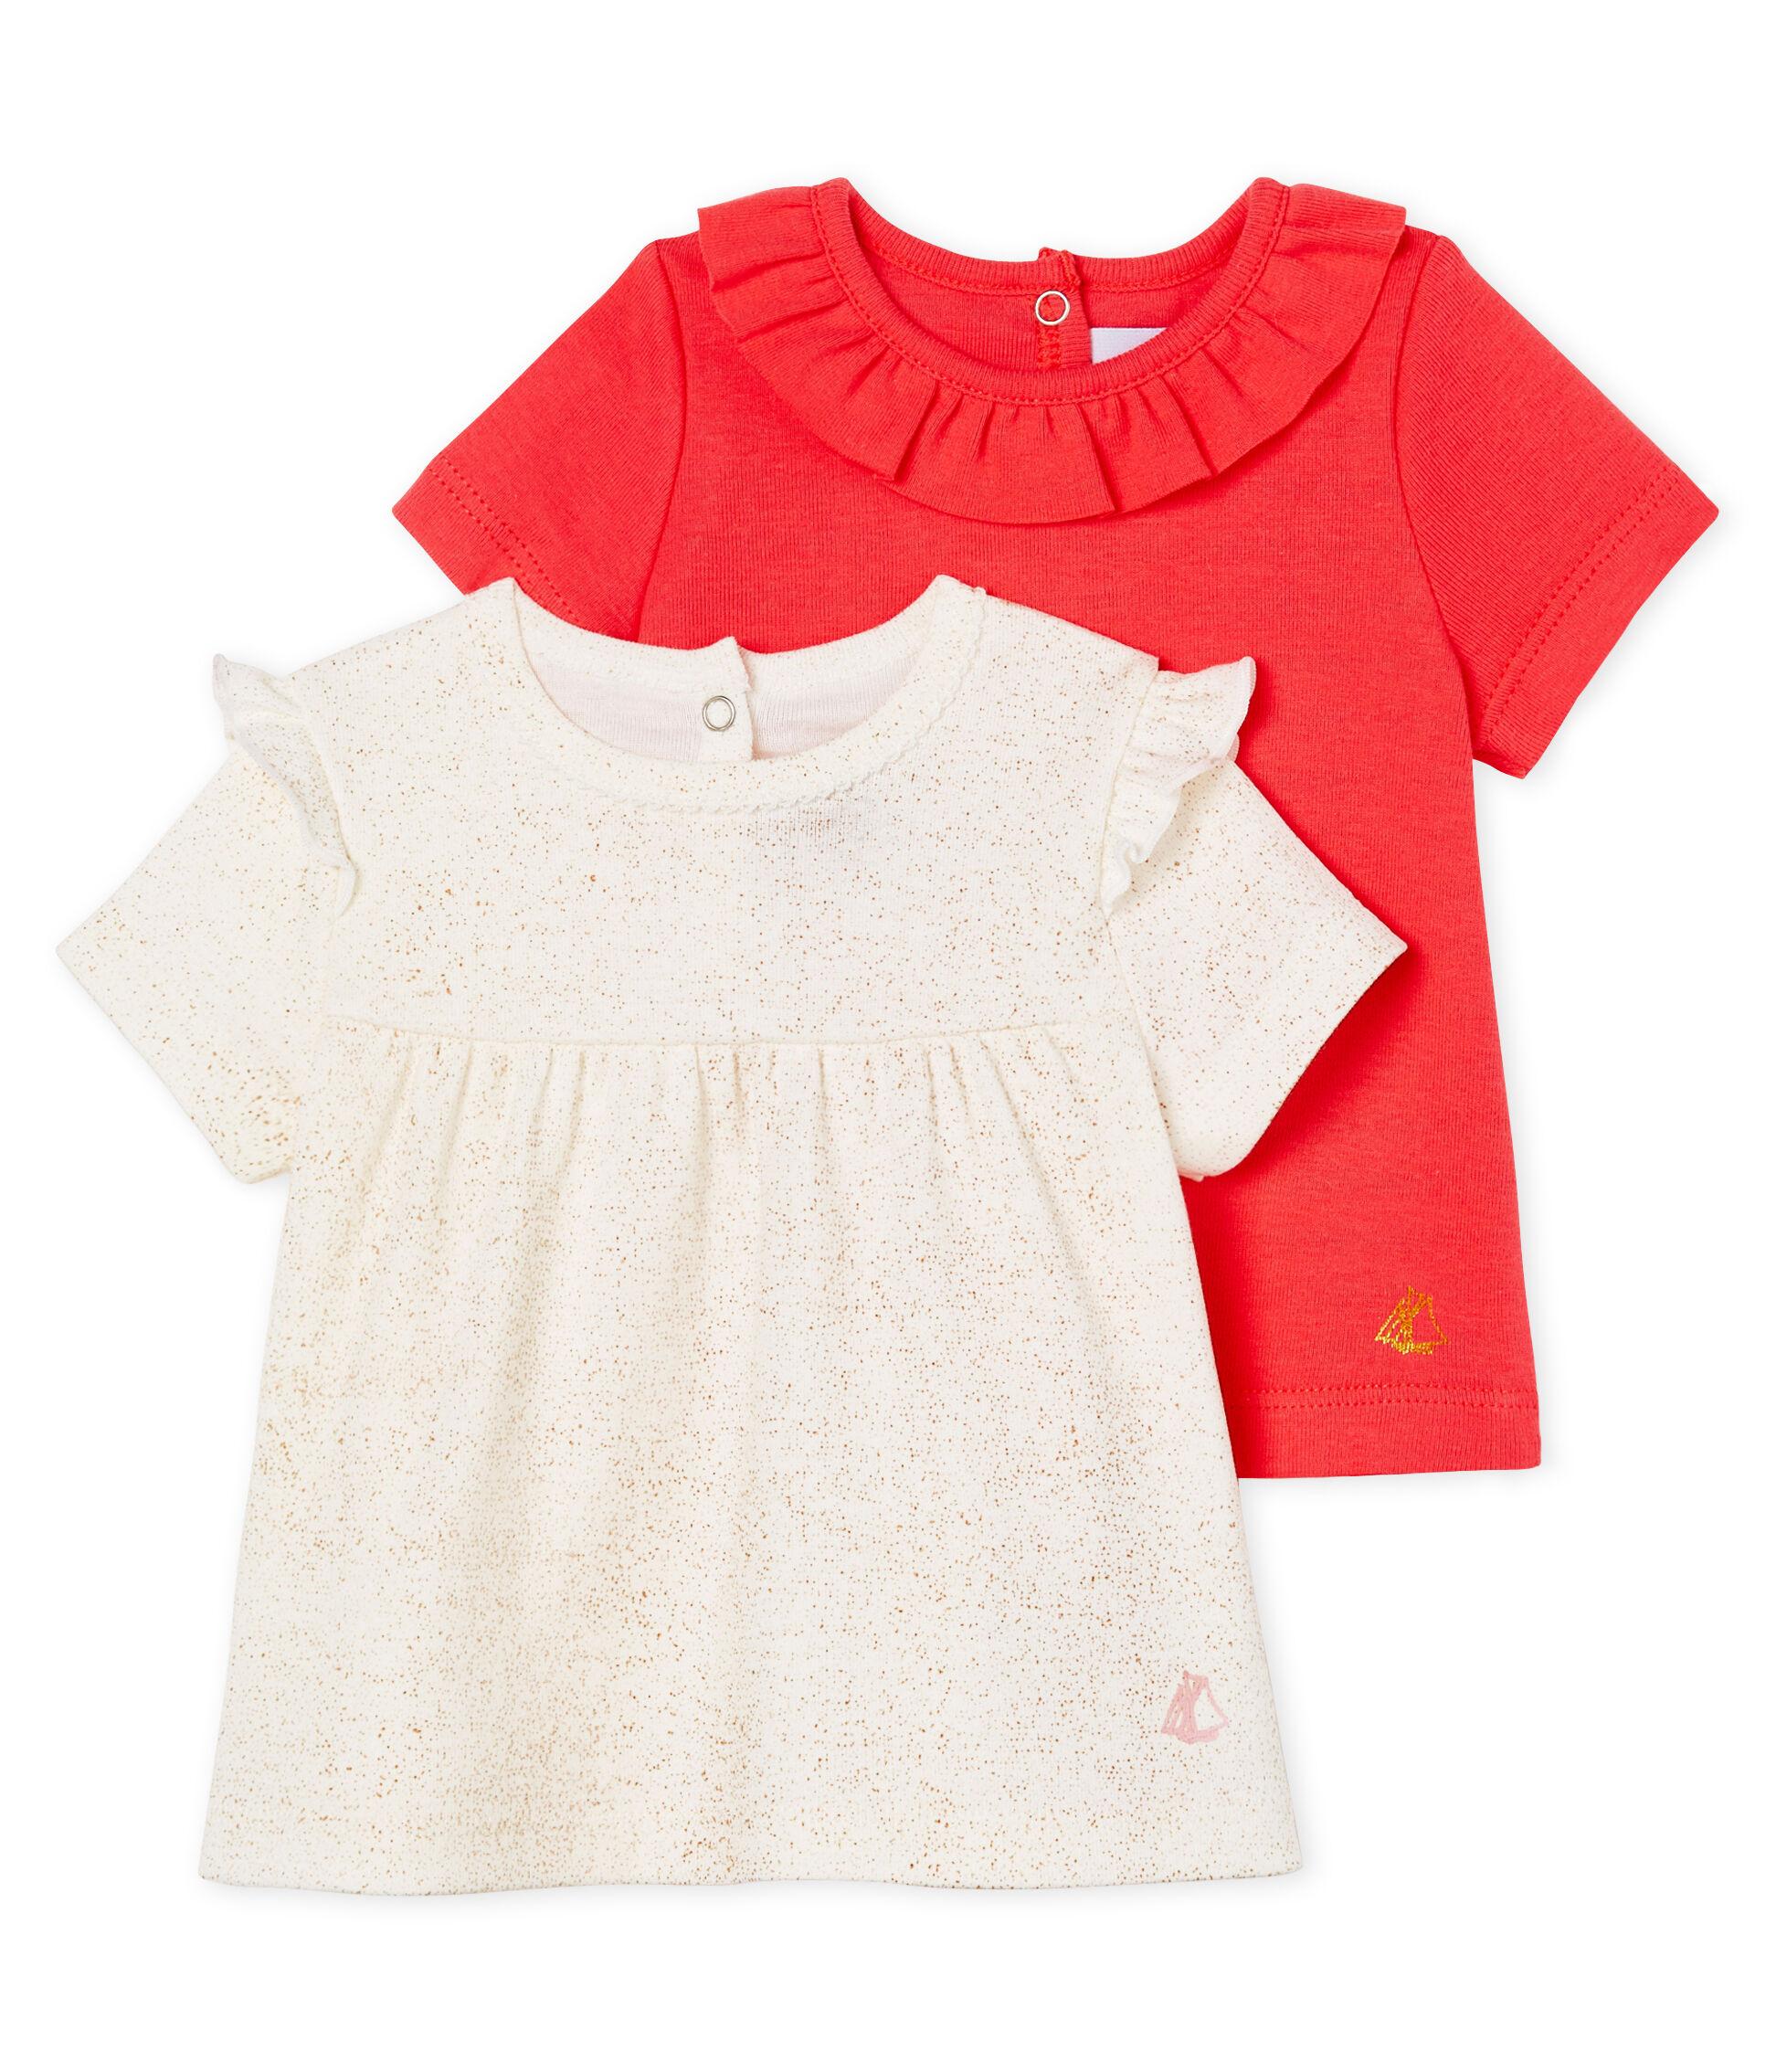 Maniche corte T-Shirts de France Magliette Beb/è femminuccia